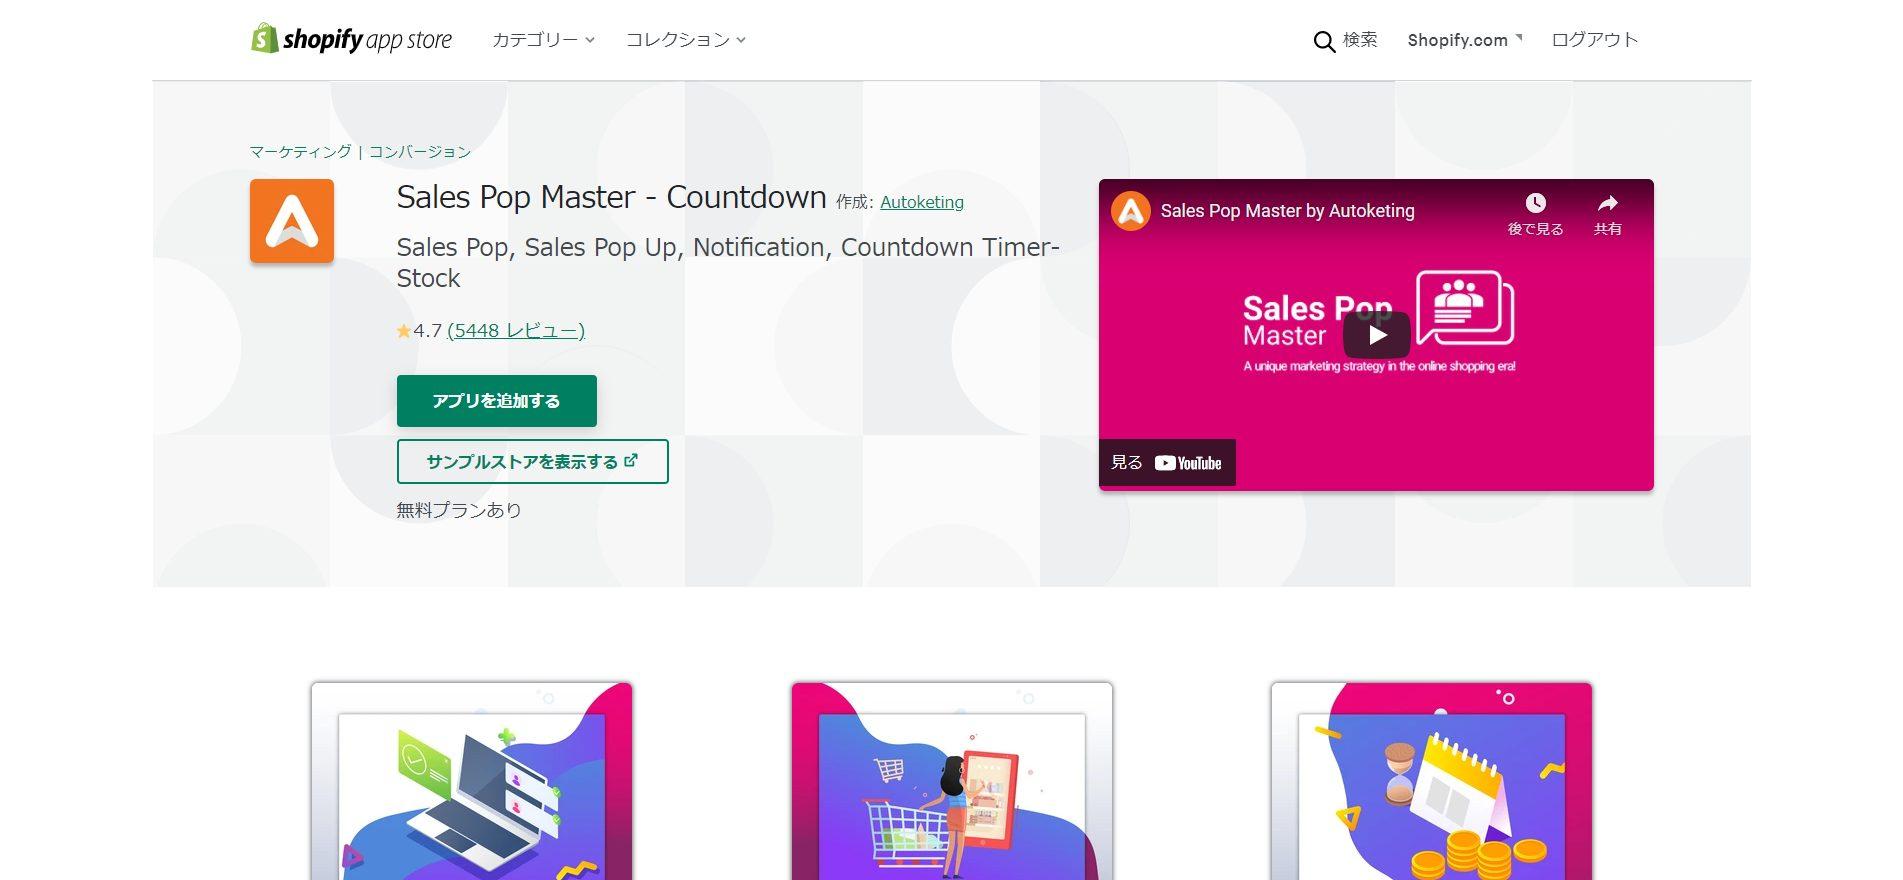 Sales Pop Master ‑ Countdownの初期設定の流れ